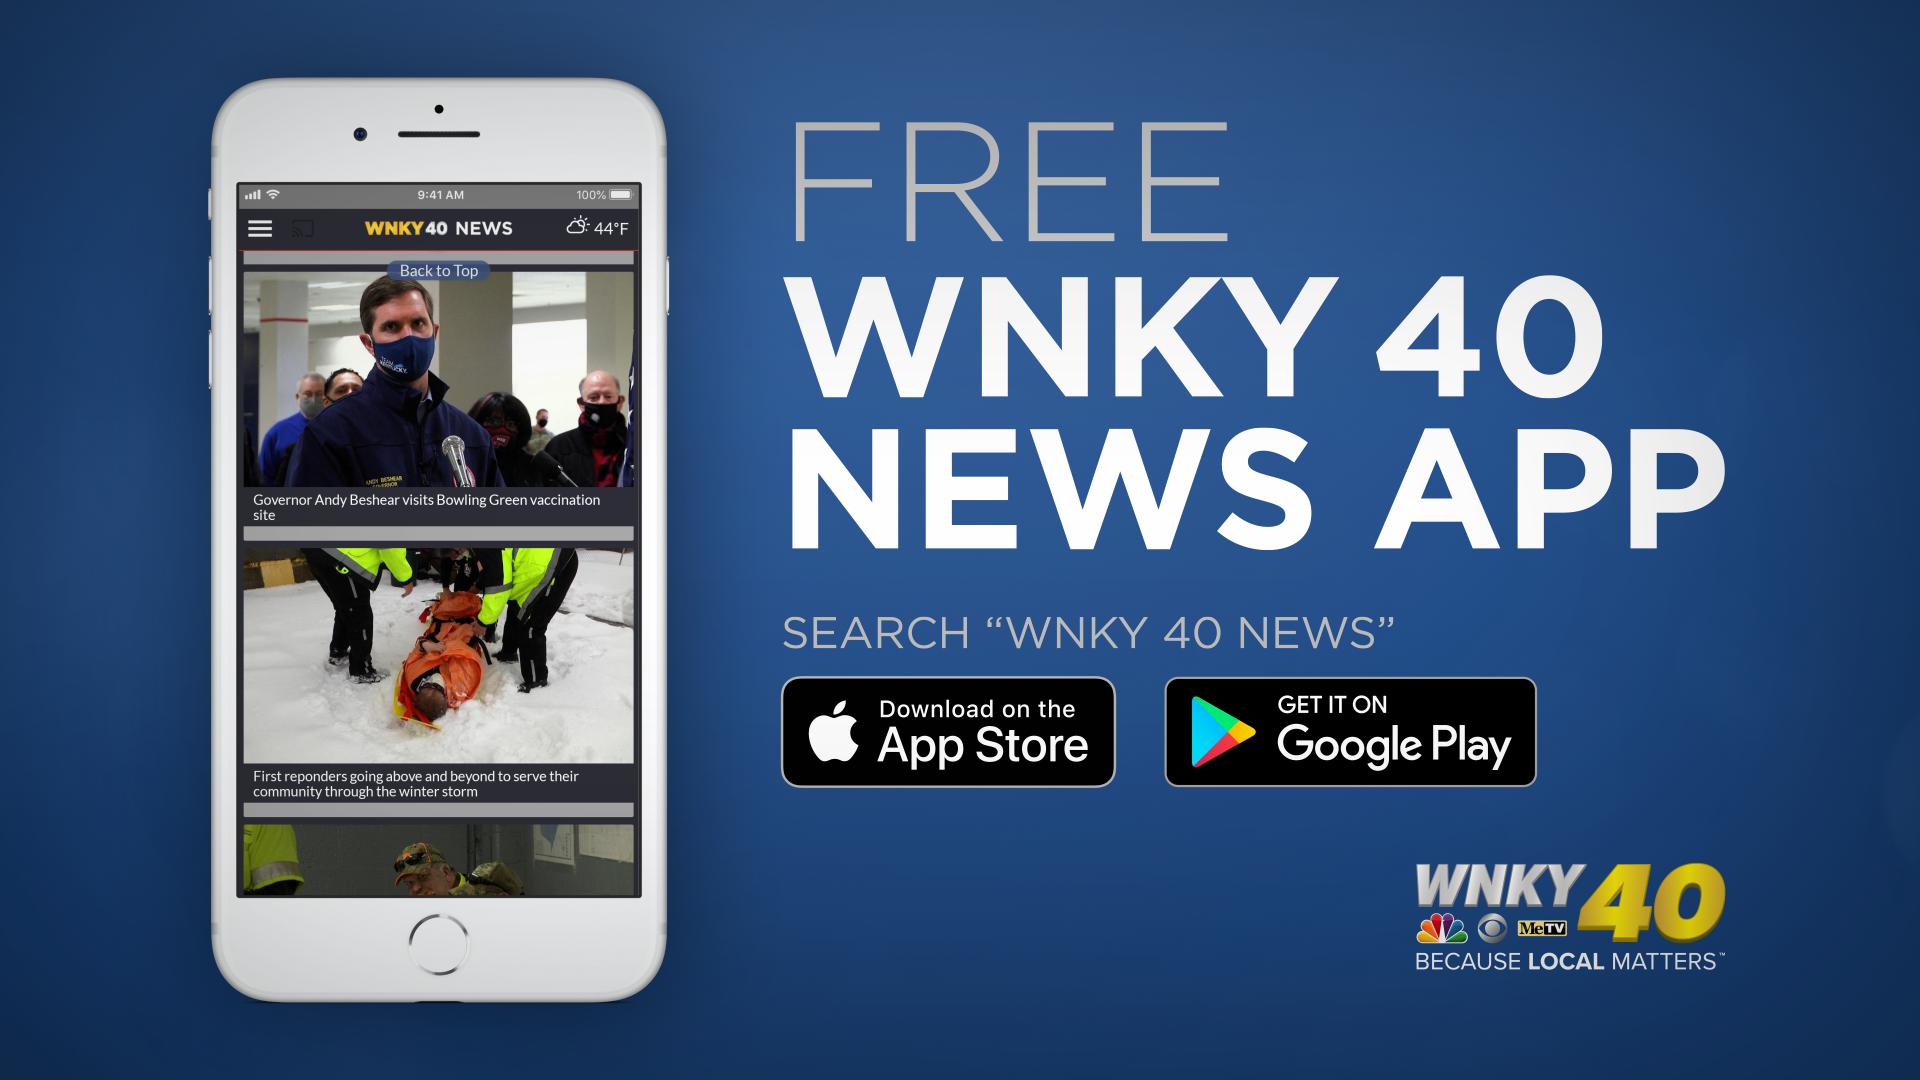 New News App